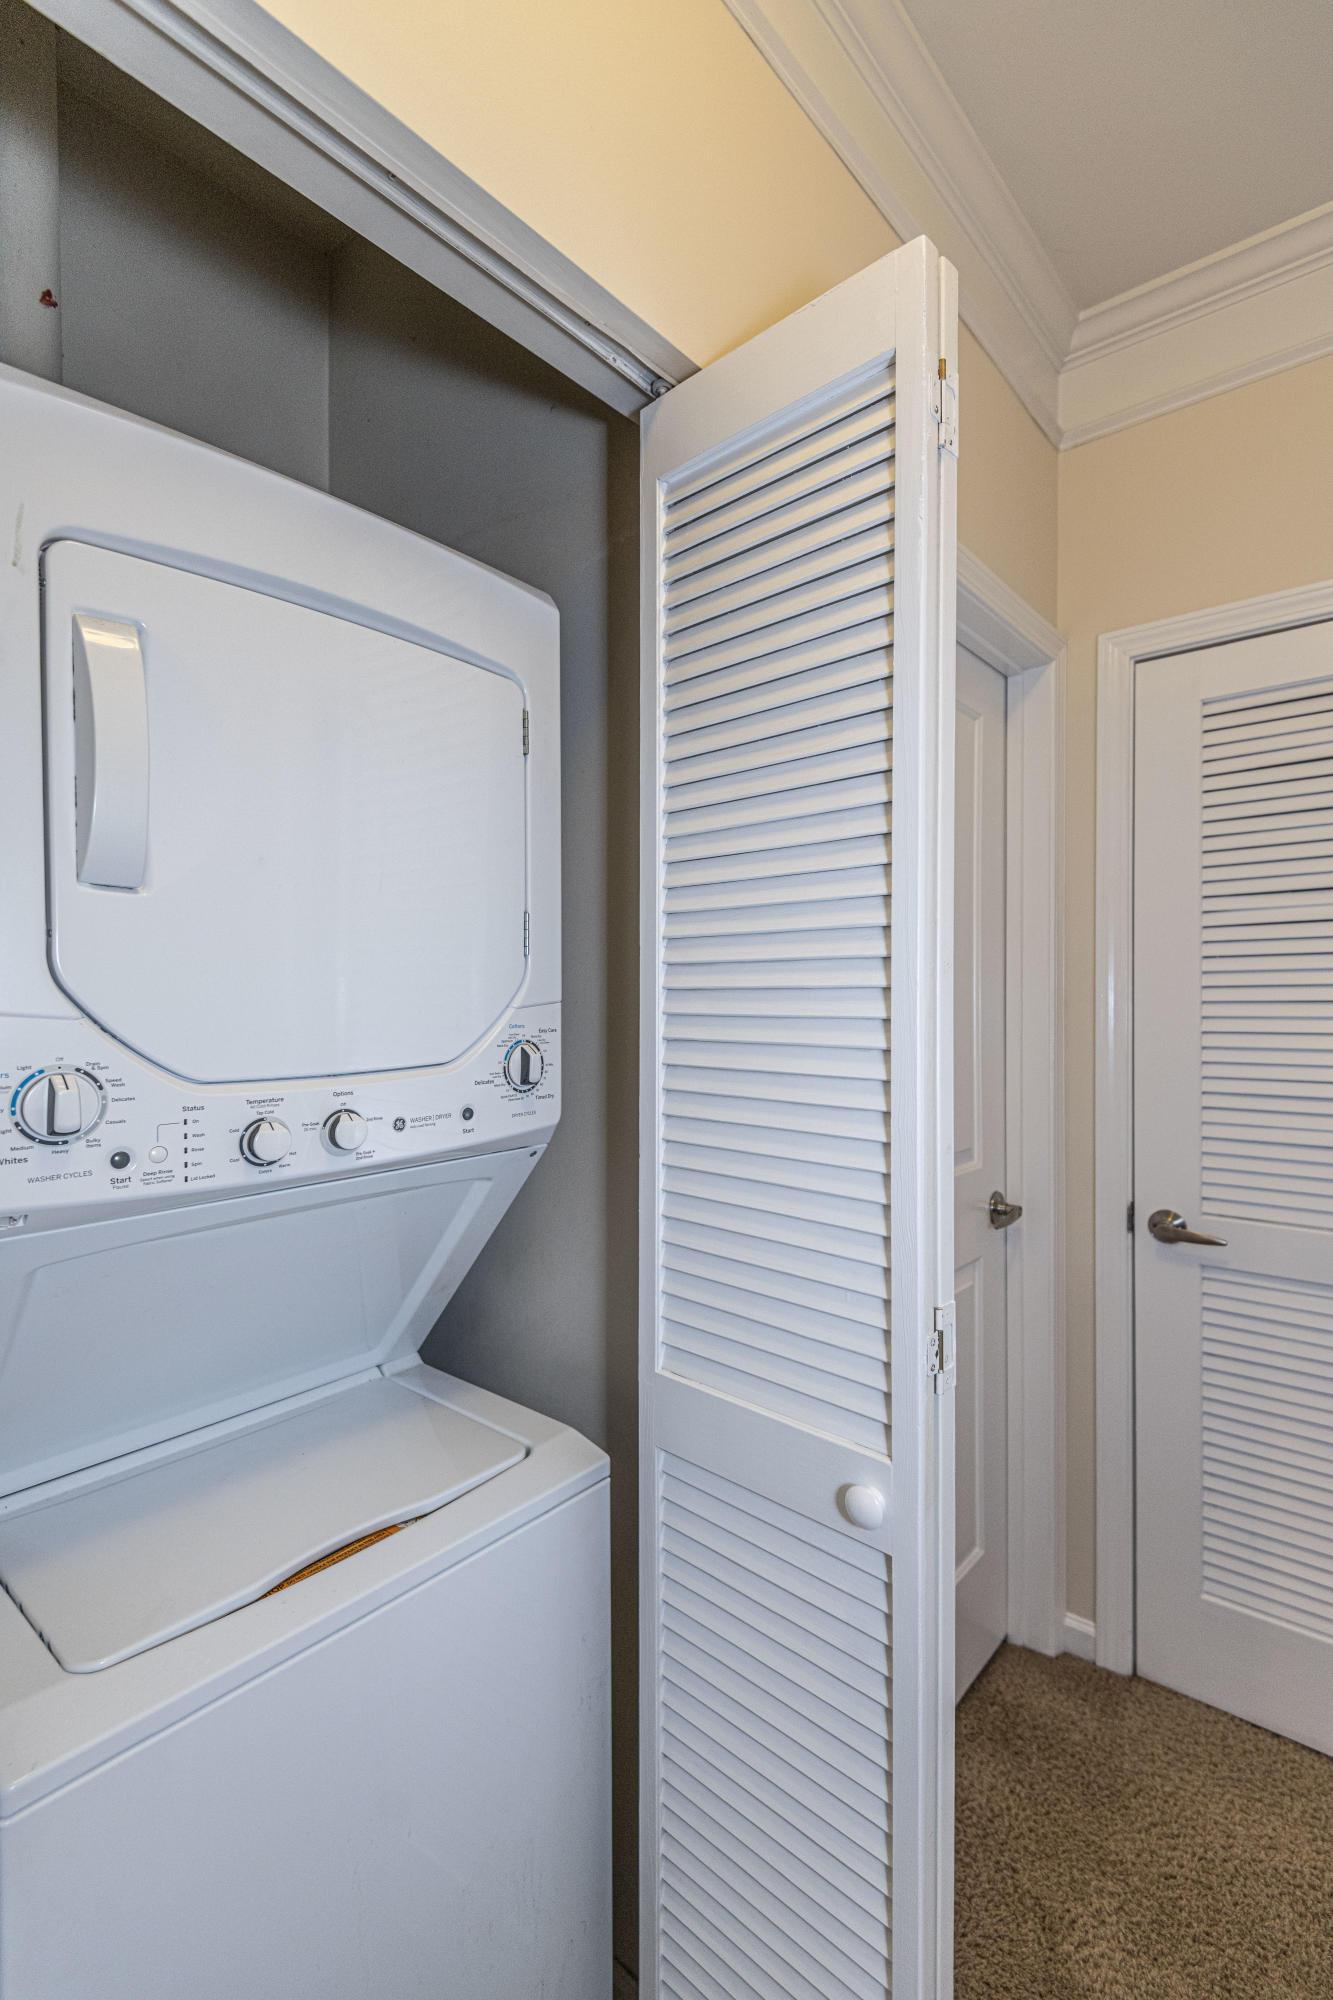 Regatta On James Island Homes For Sale - 1755 Central Park Rd, Charleston, SC - 23